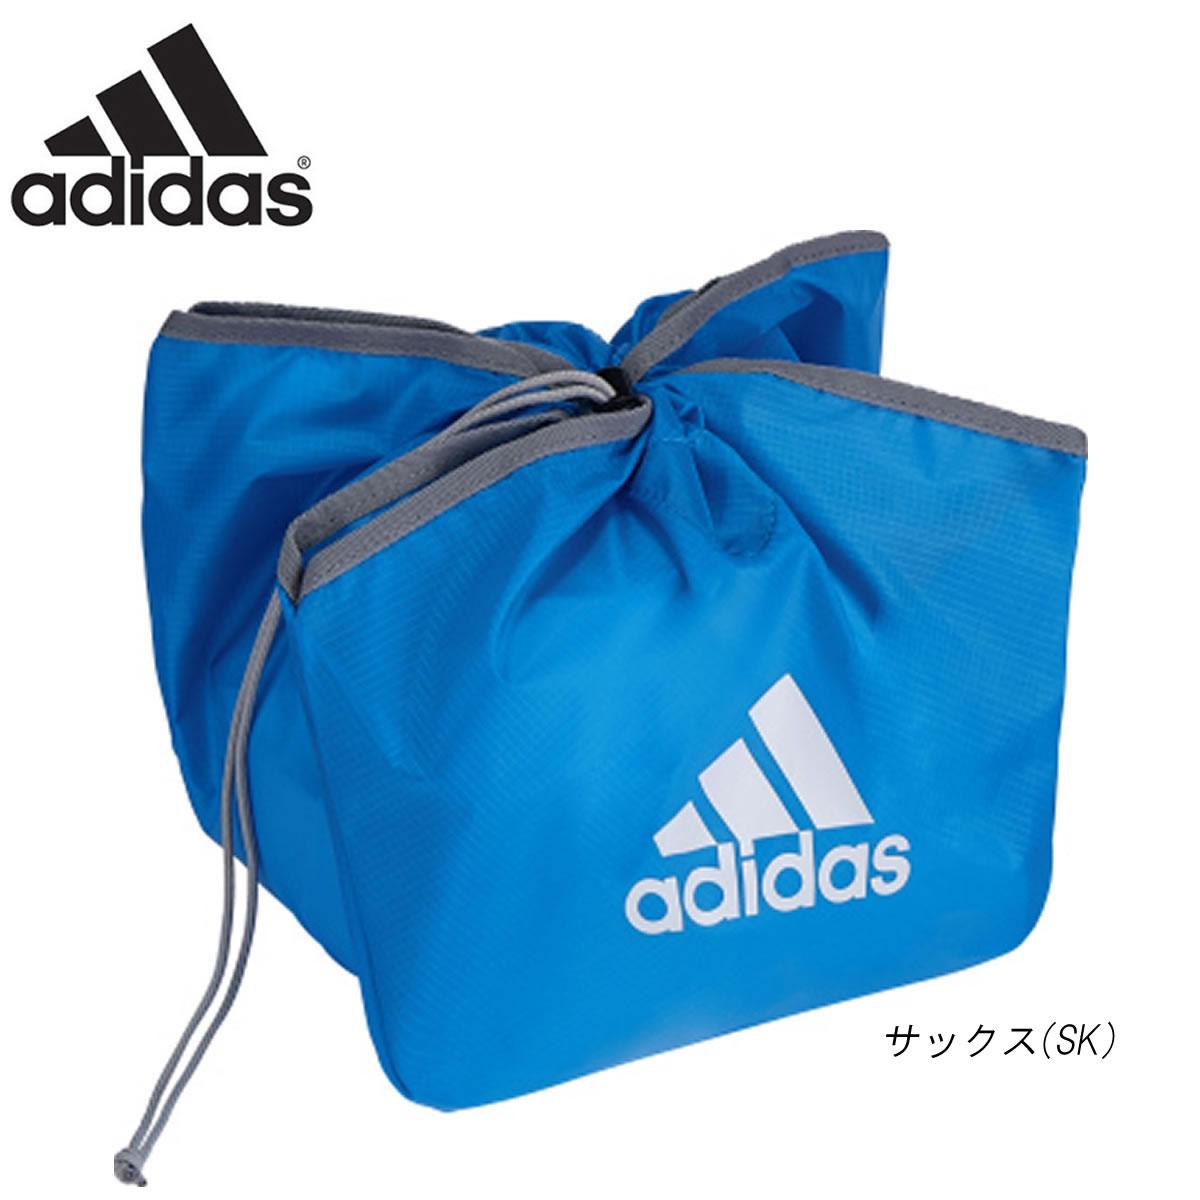 adidas スーパーSALE セール期間限定 ABN01SK 5☆好評 新型ボールネット バスケットボール 取り寄せ 2021 アディダス